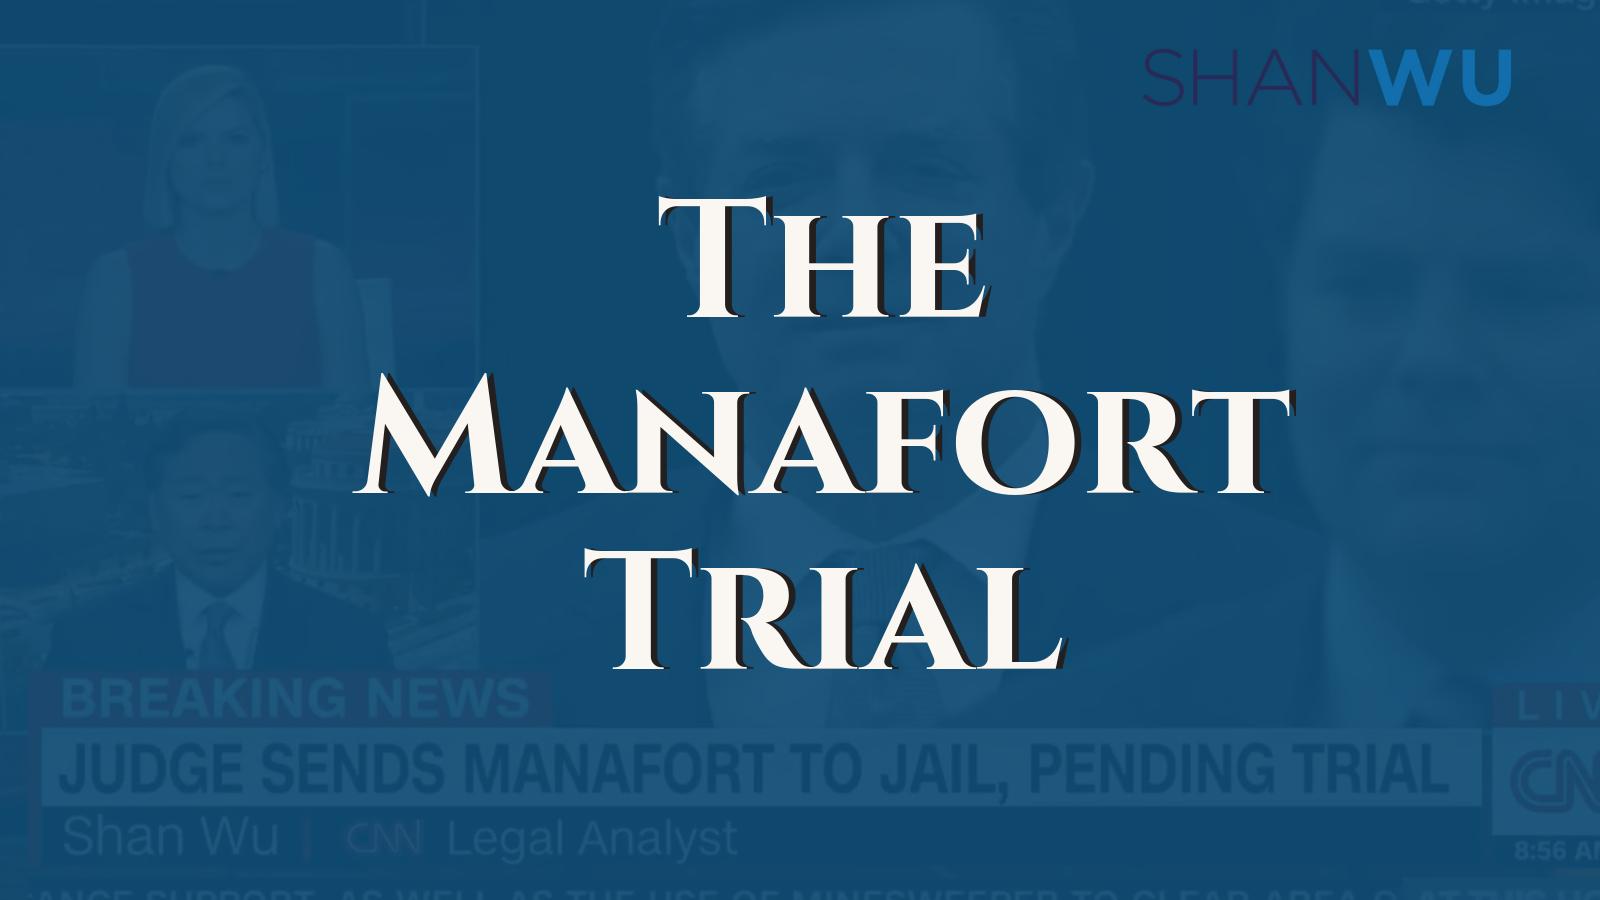 manafort trial recap - Shanlon Wu